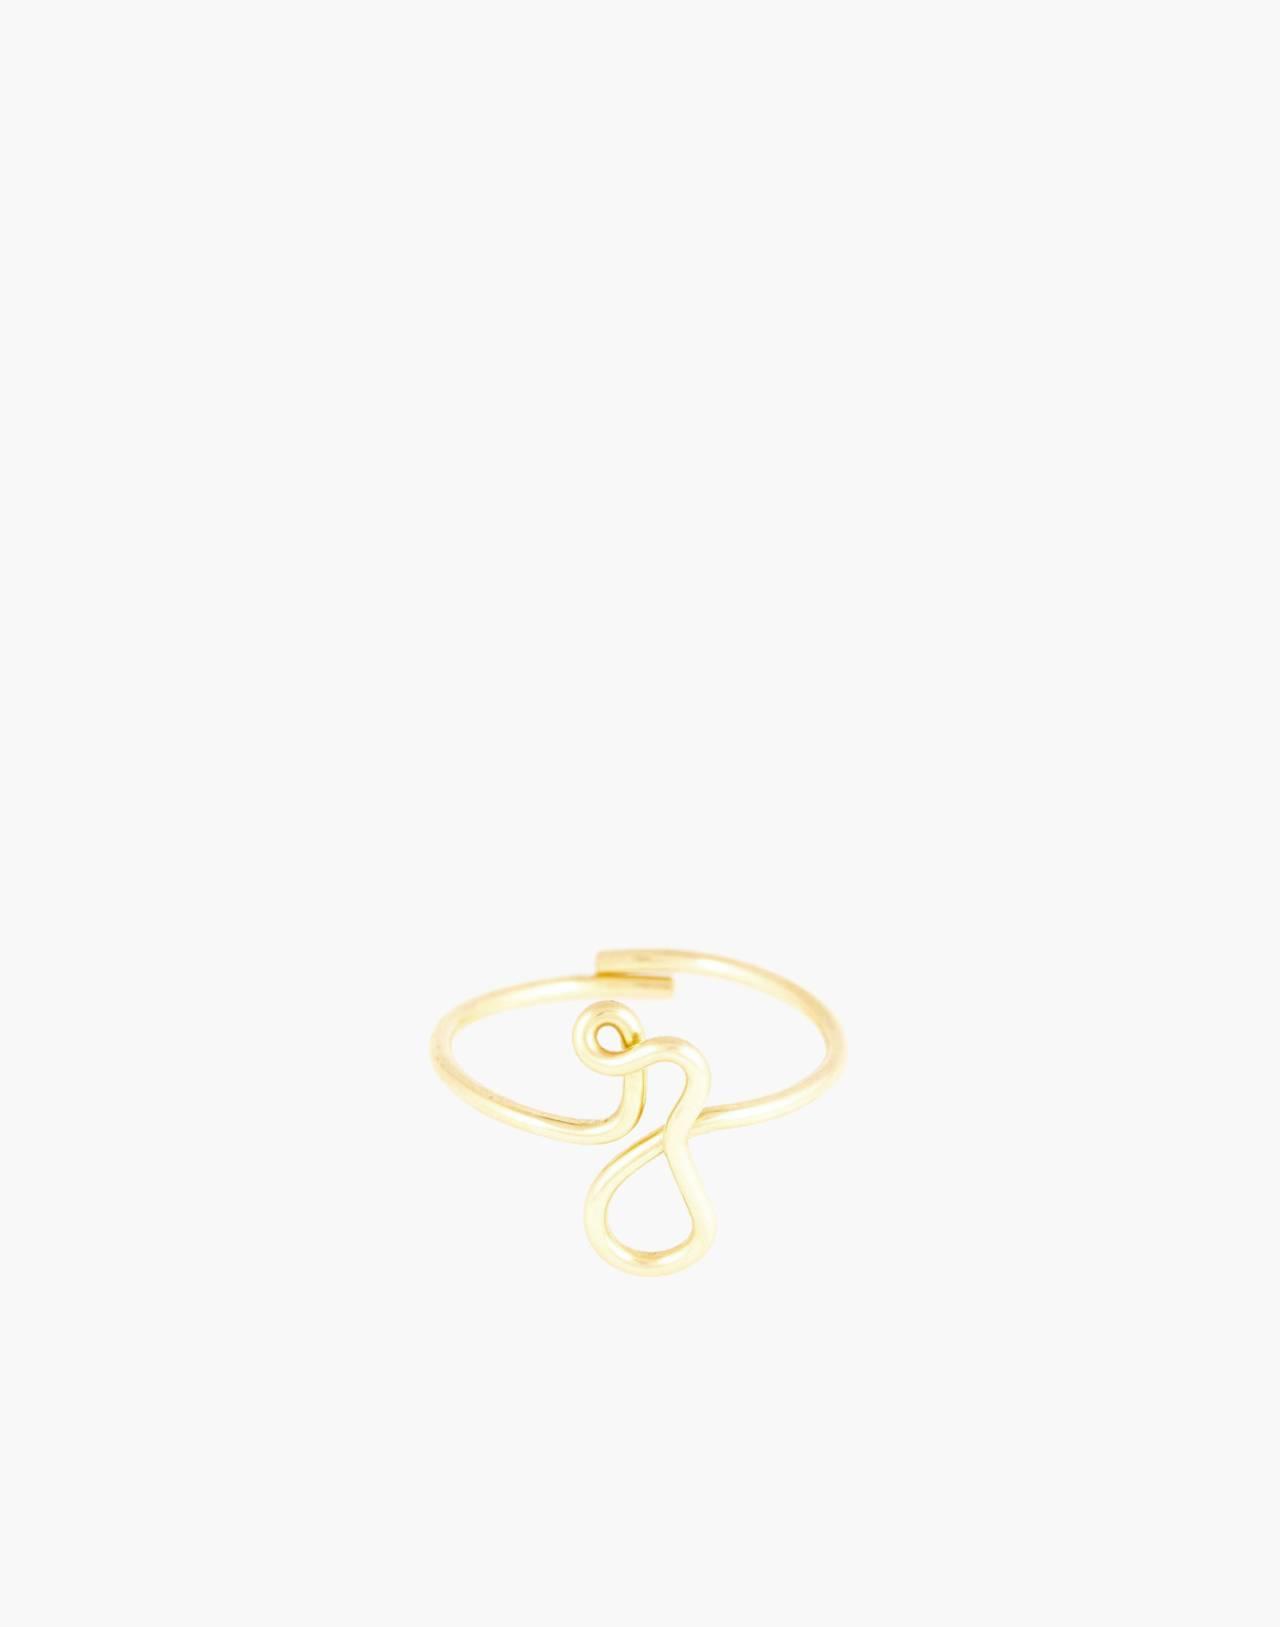 Atelier Paulin™ Poetic Letter Ring in letter z image 1